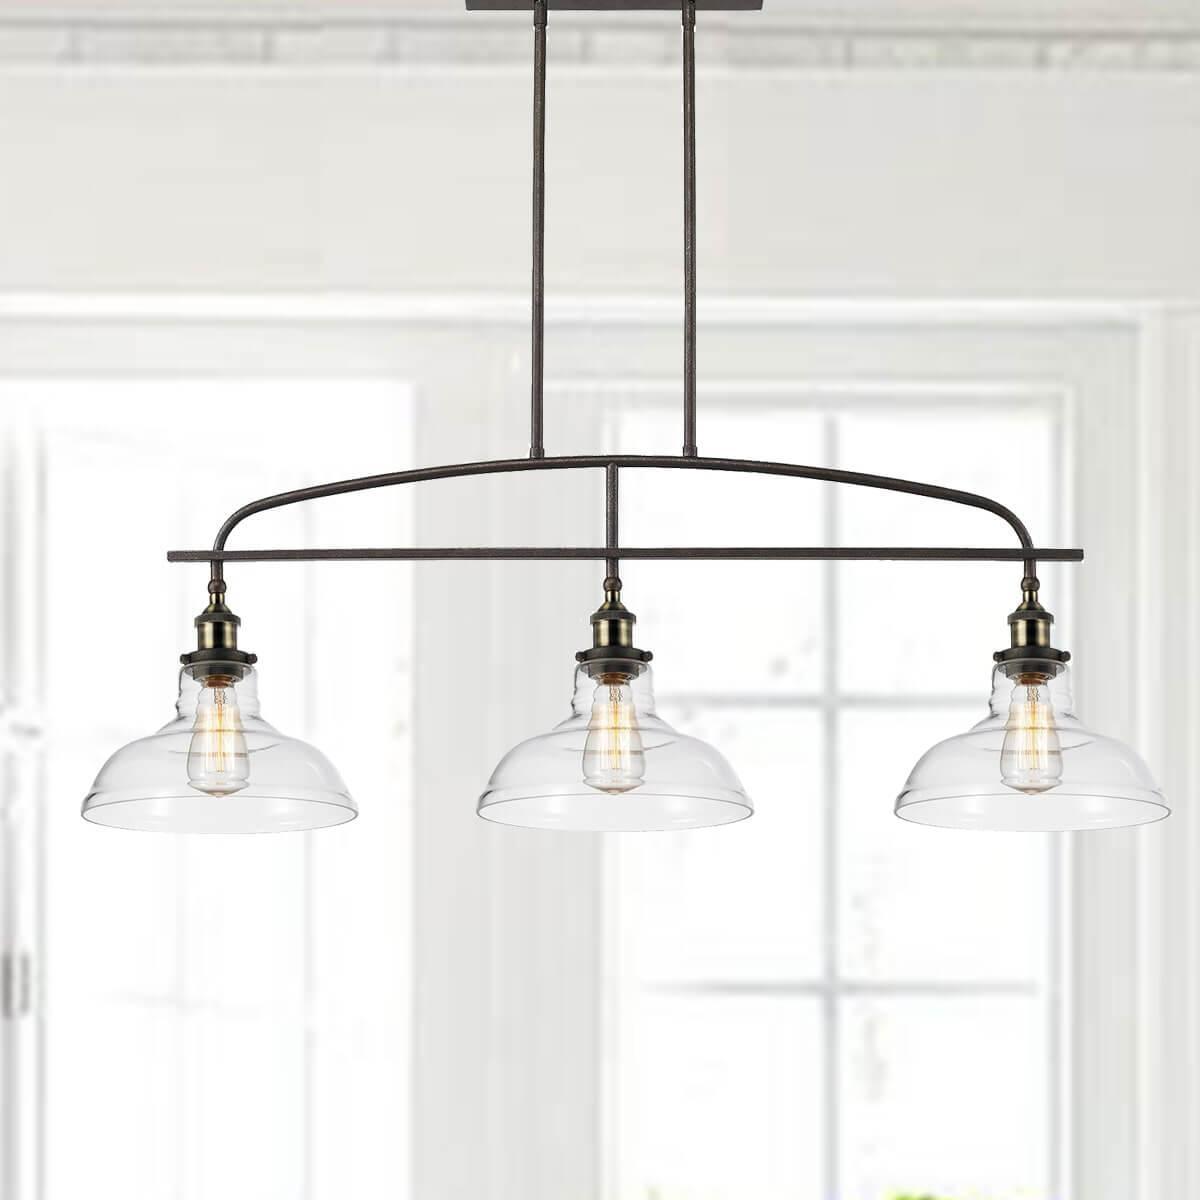 3-Light Glass Kitchen Linear Island Pendant Lighting